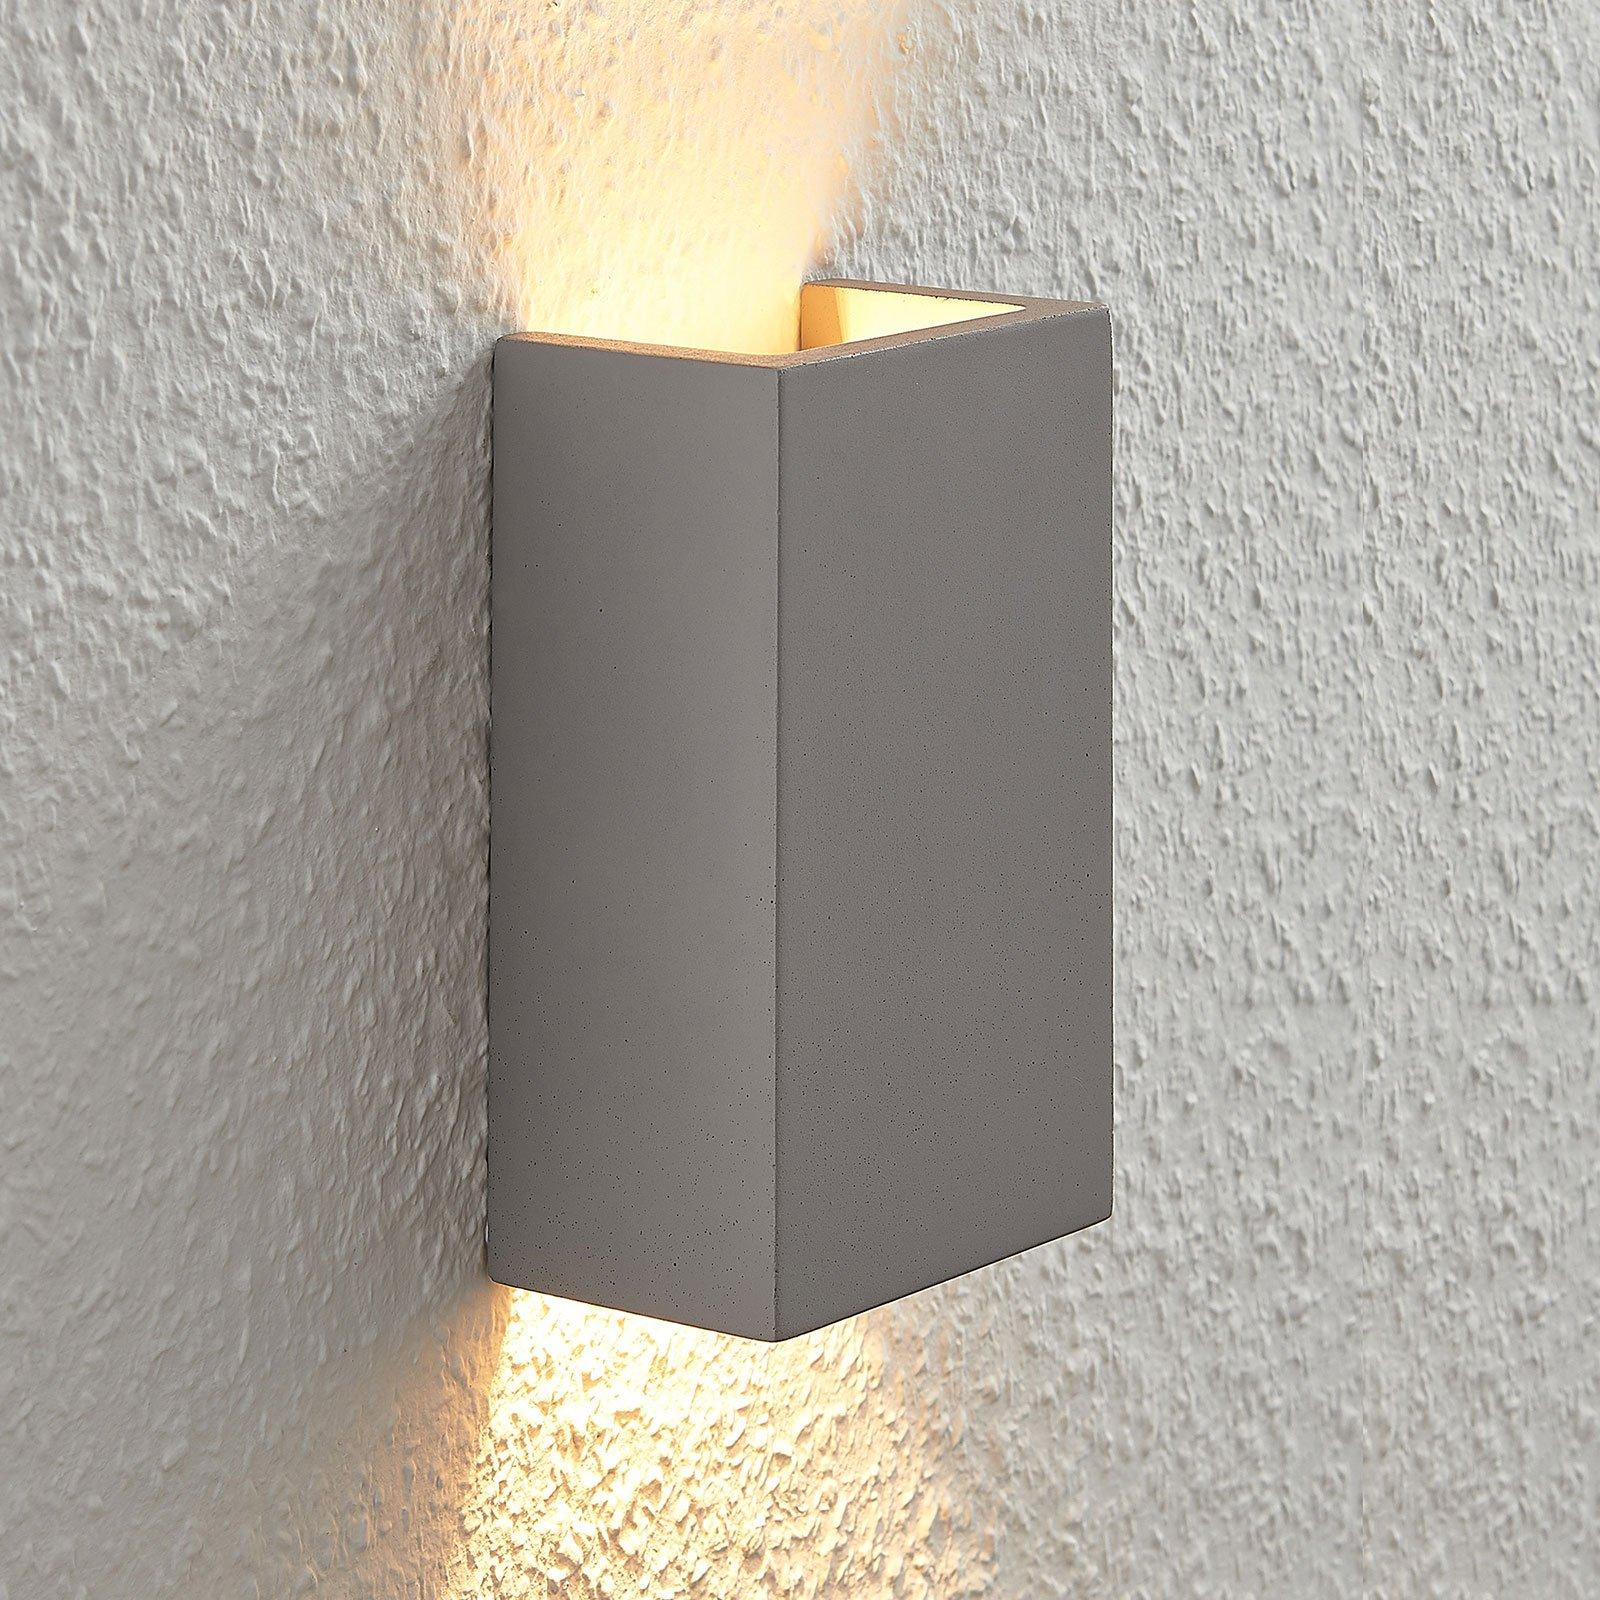 Betongvegglampe Smira i grått, 11x18cm